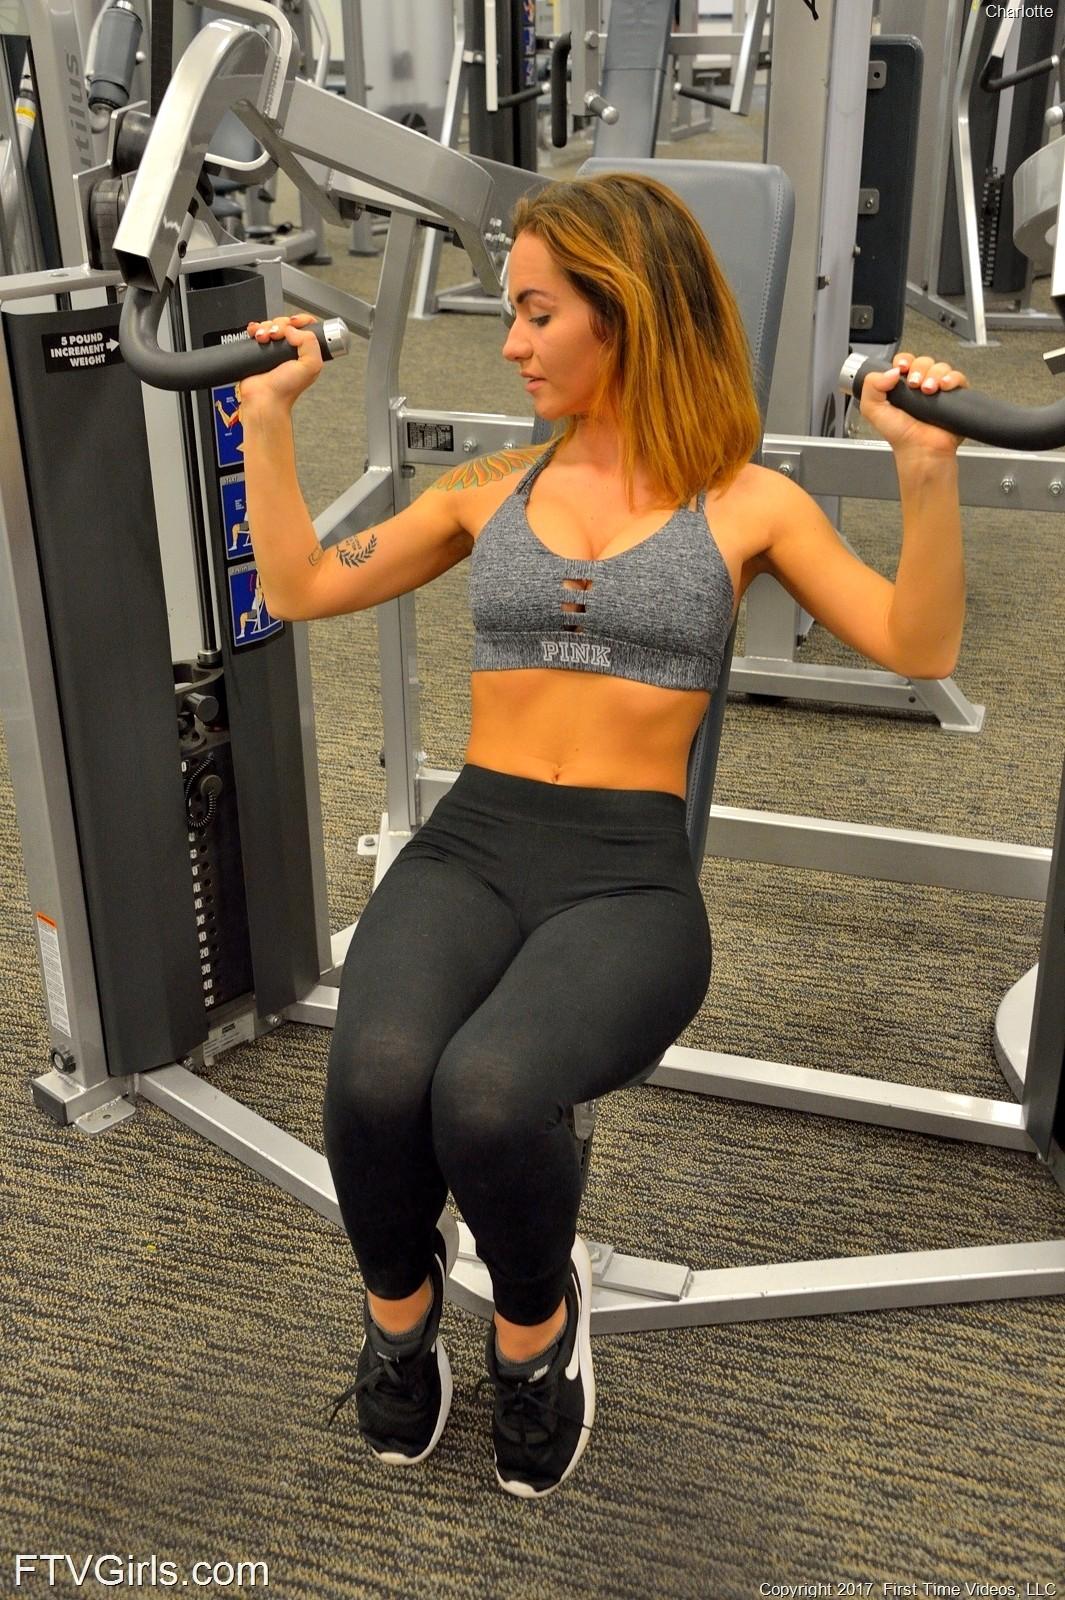 Babe Today Ftv Girls Charlotte Ftv Sexist Fitness